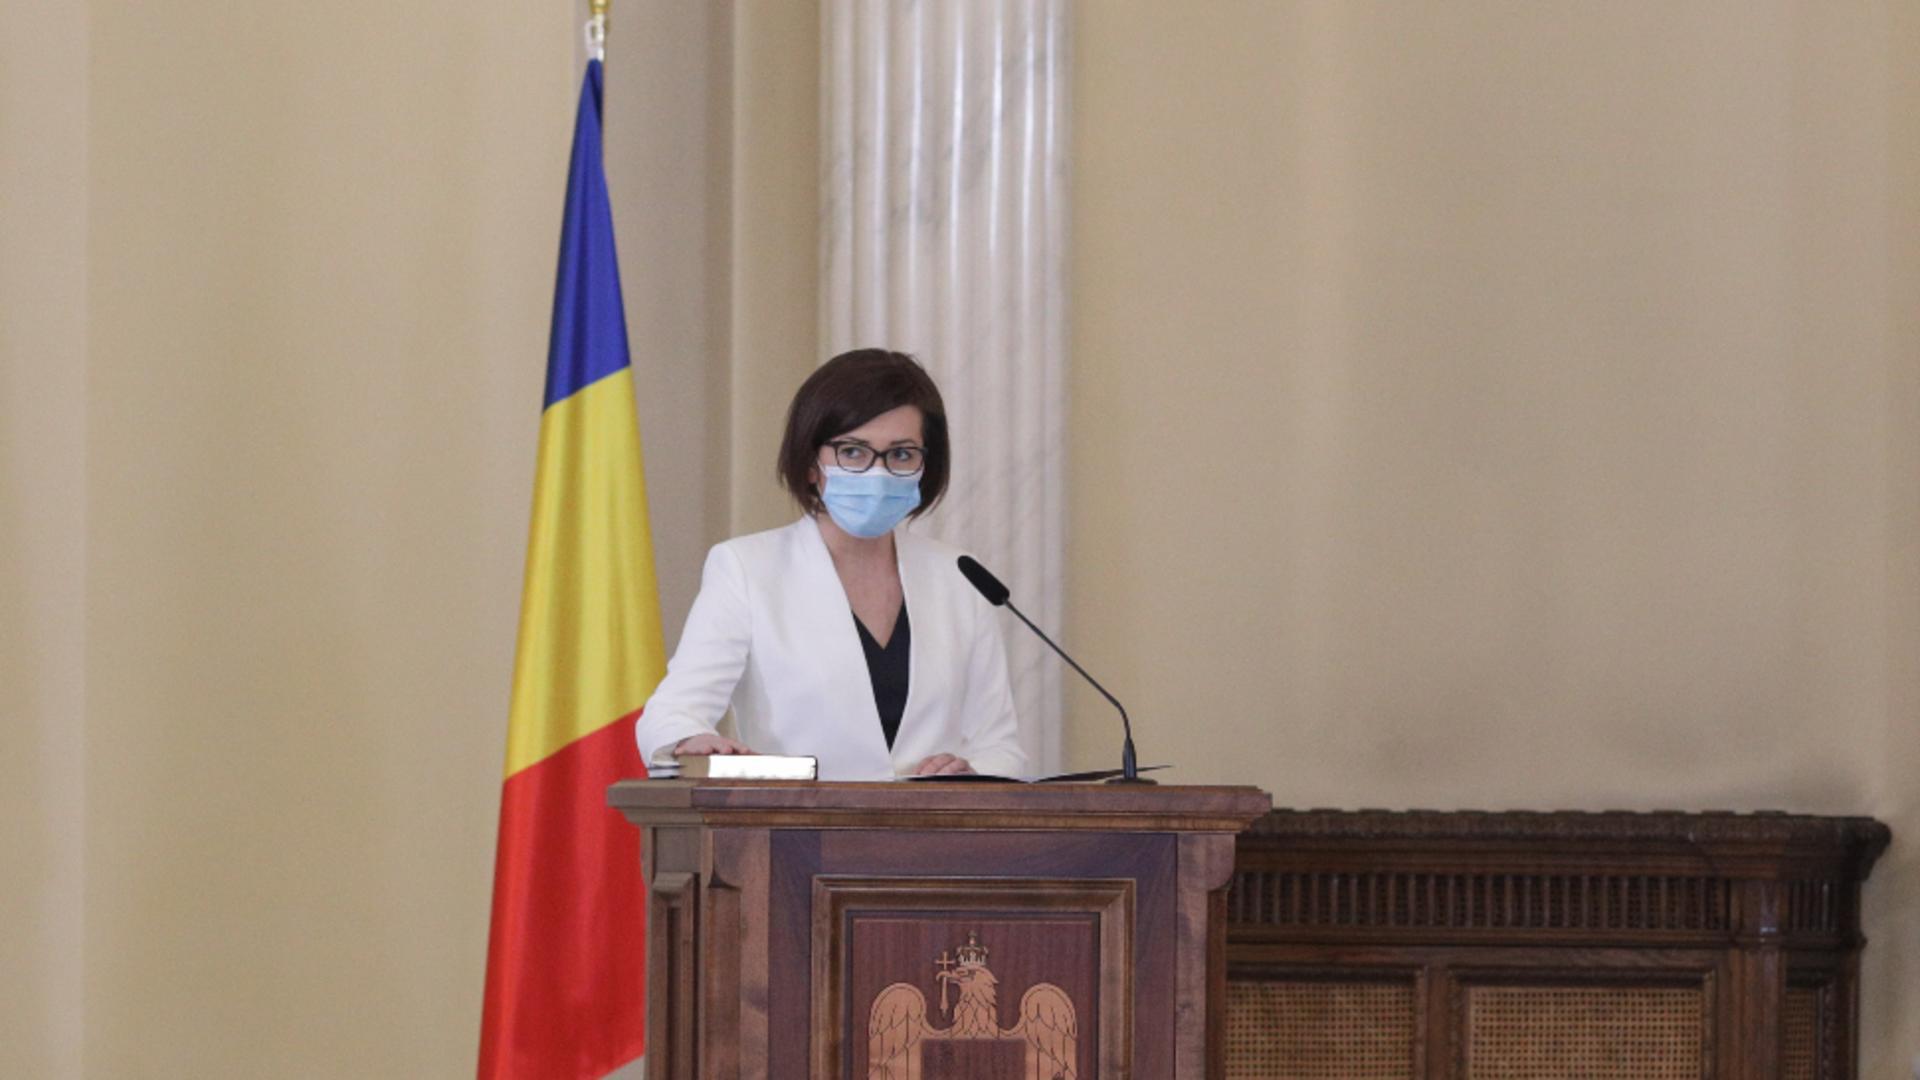 Ioana Mihăila/sursa foto: Octav Ganea, INQUAM